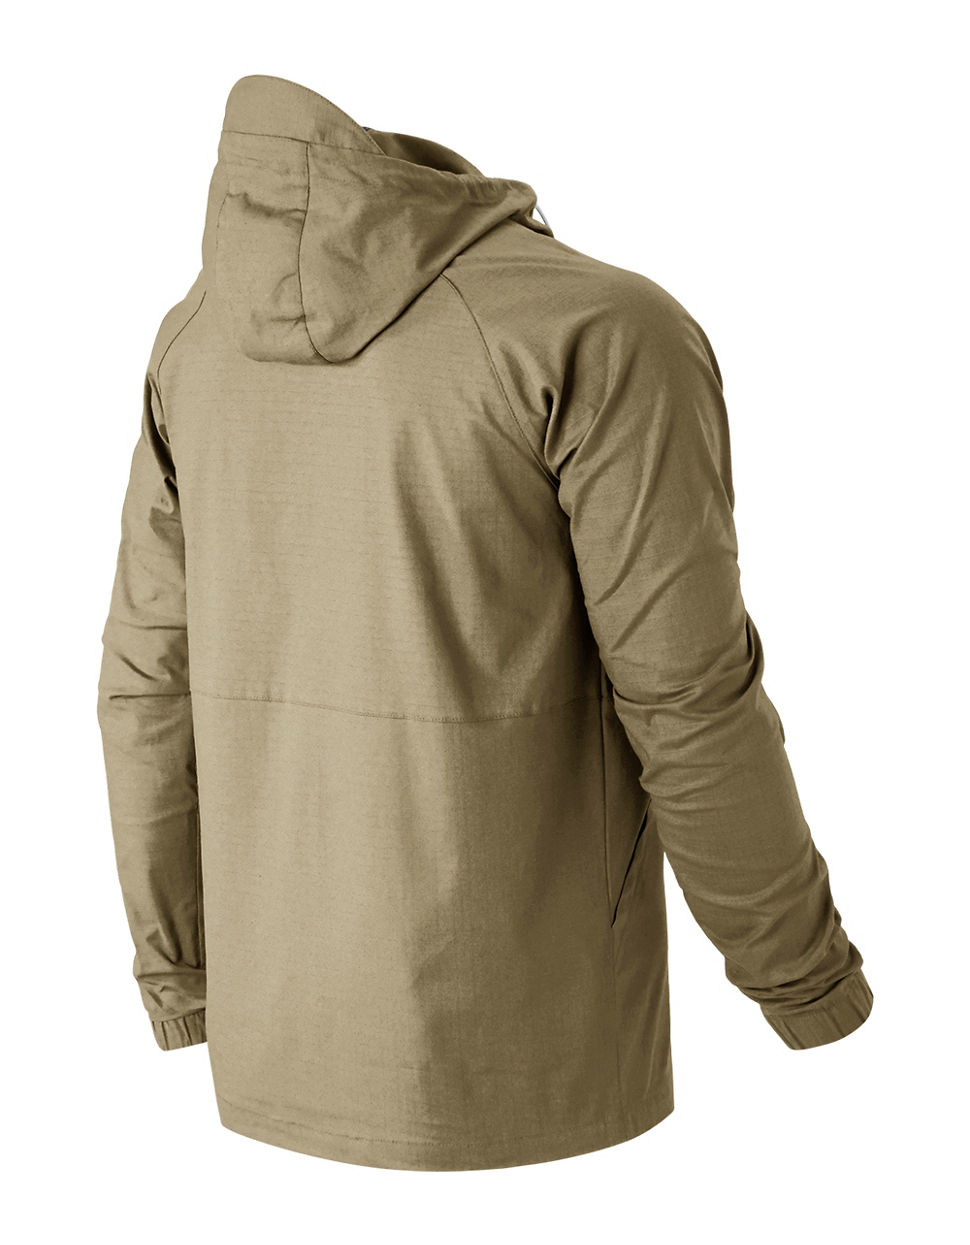 lyst new balance anorak jacket in brown for men. Black Bedroom Furniture Sets. Home Design Ideas